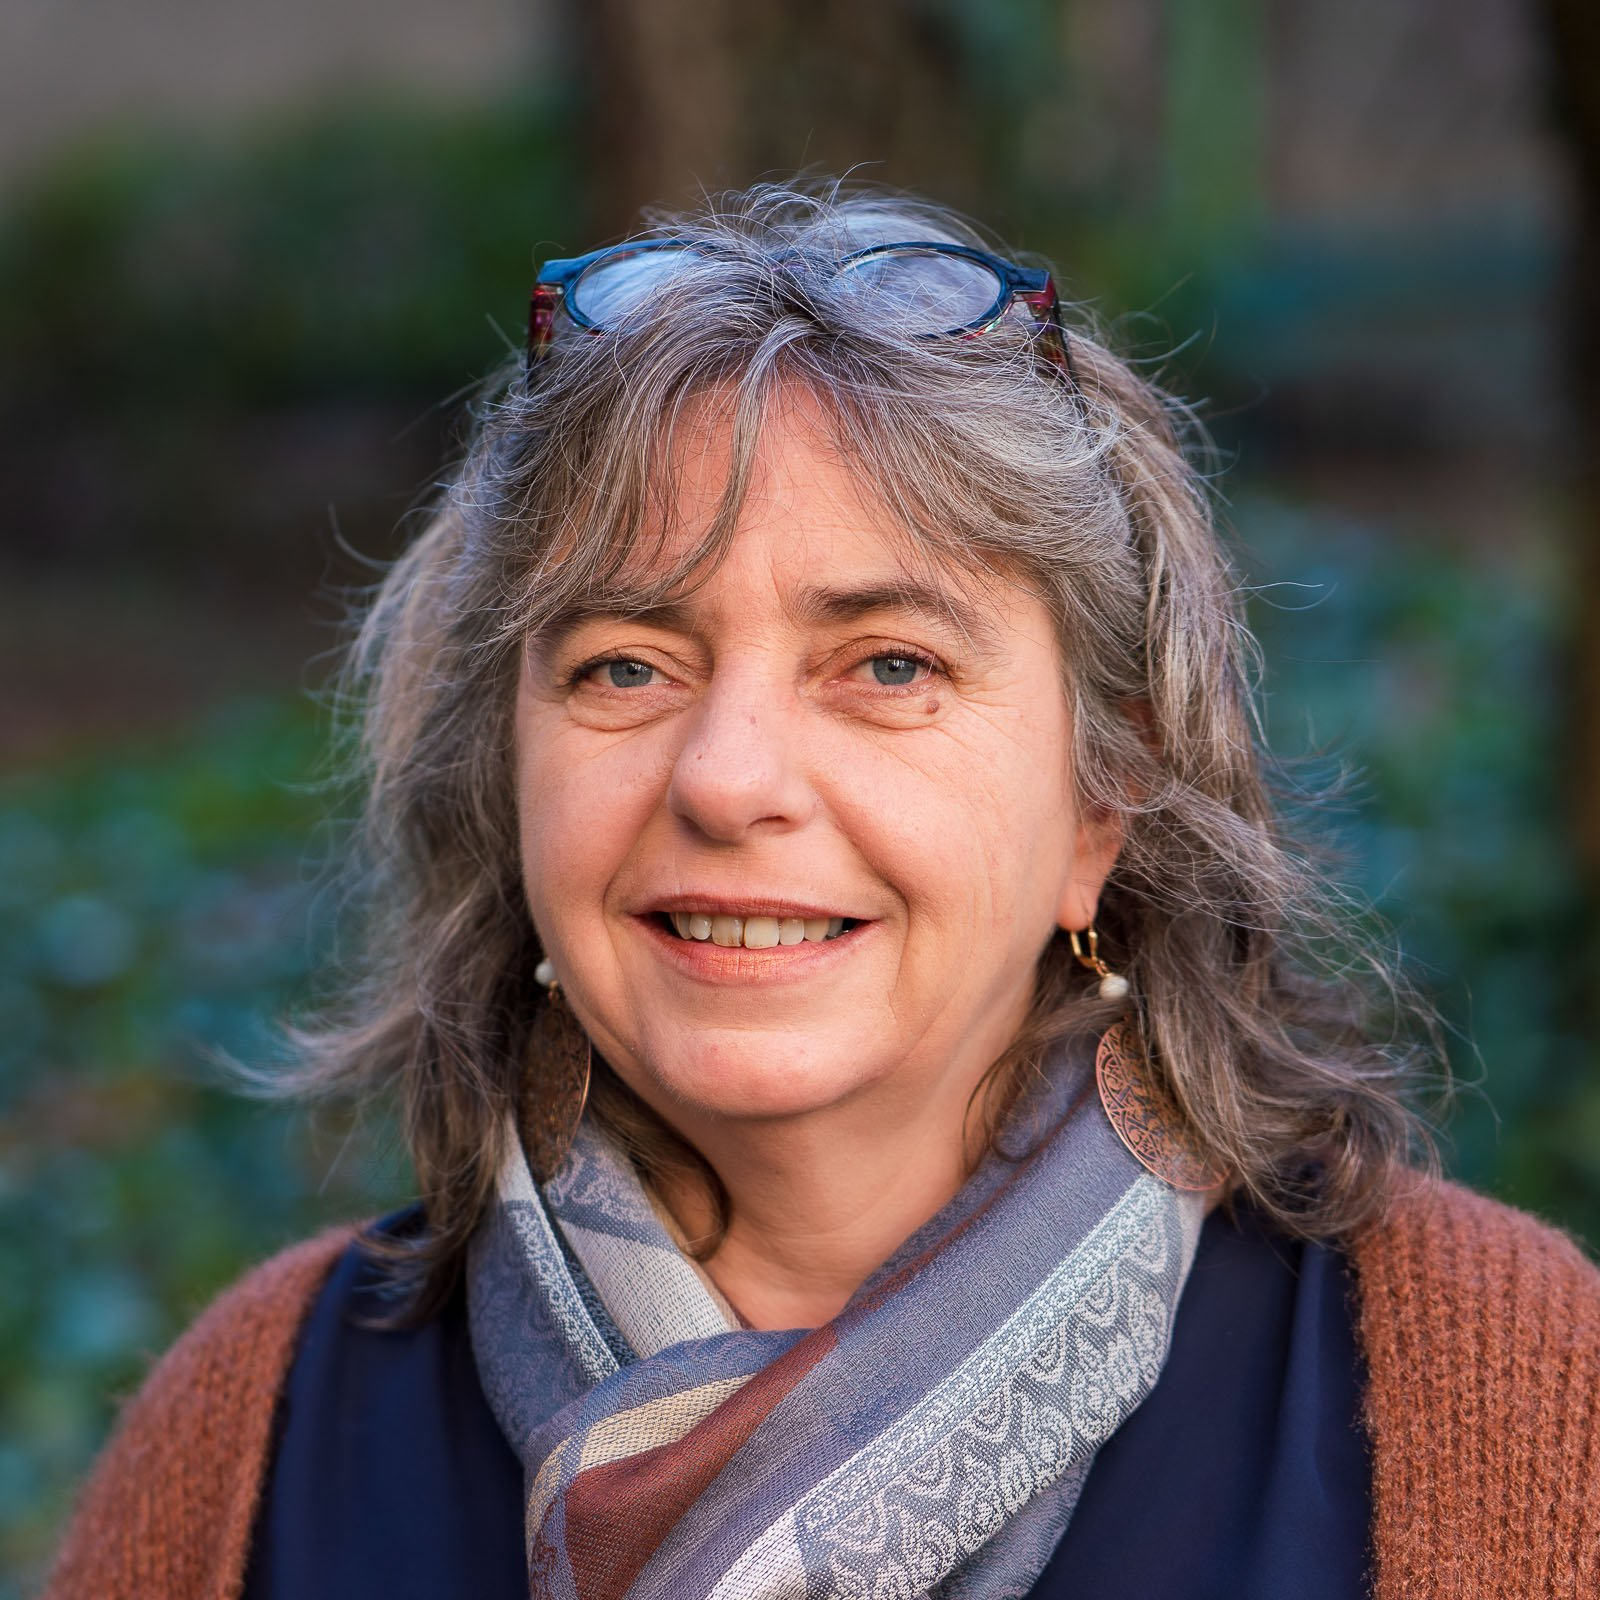 Sylvie Fougères